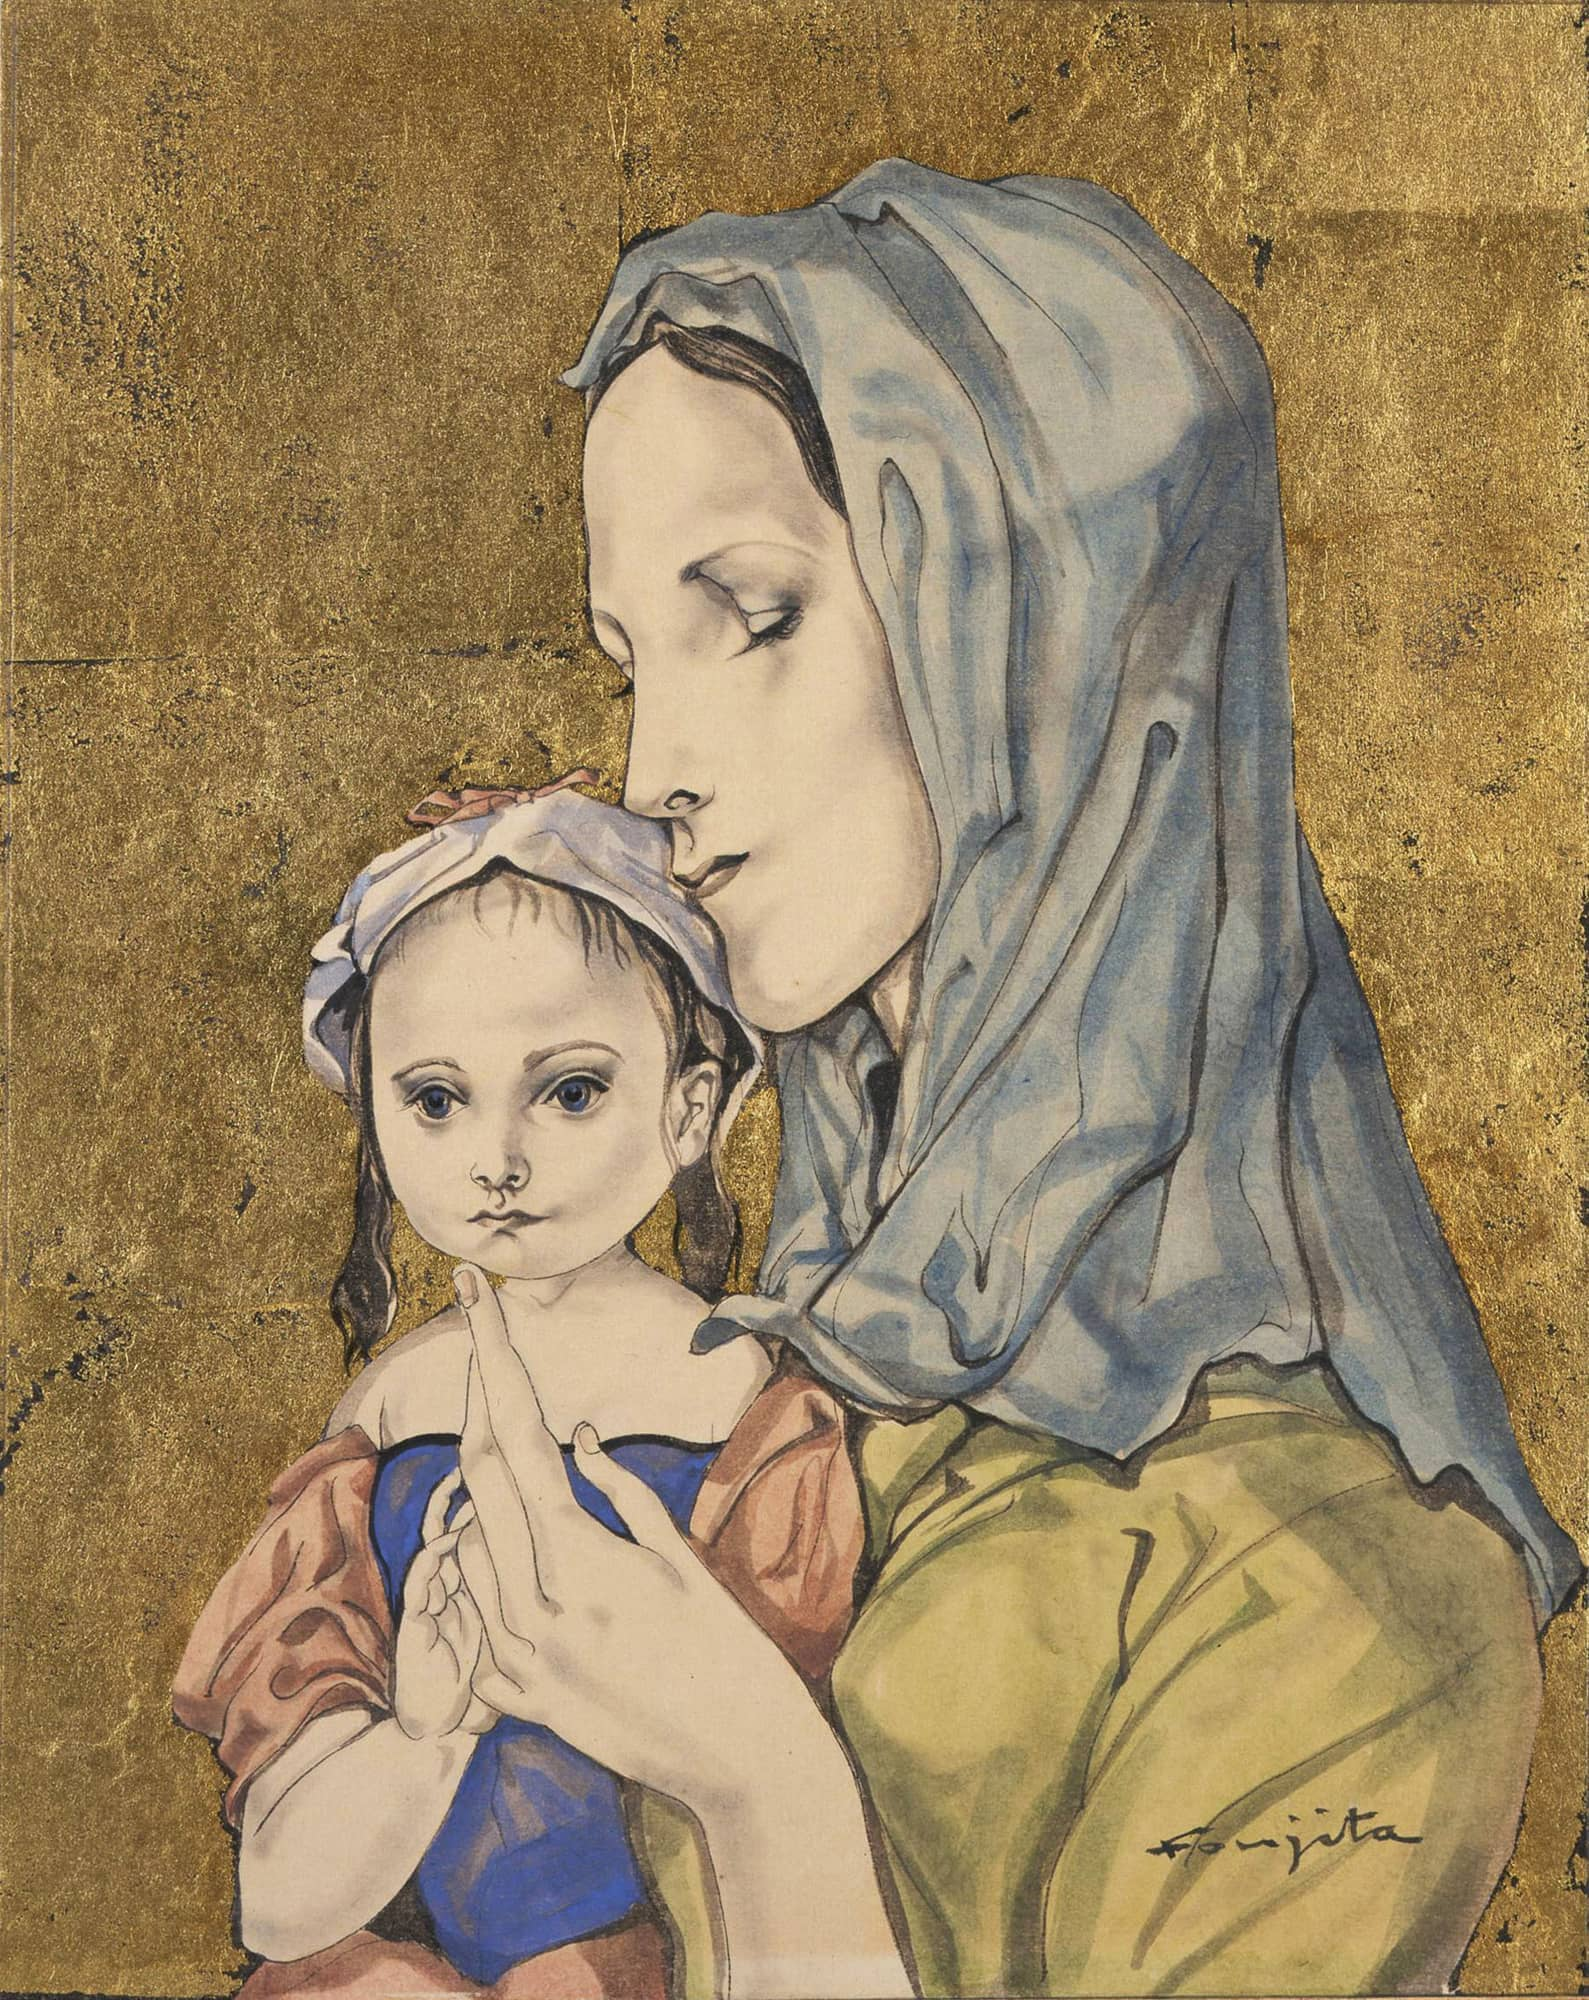 foujita - mere et enfant c 1959 foujita maternite 1952 newsletter art comes to you 8